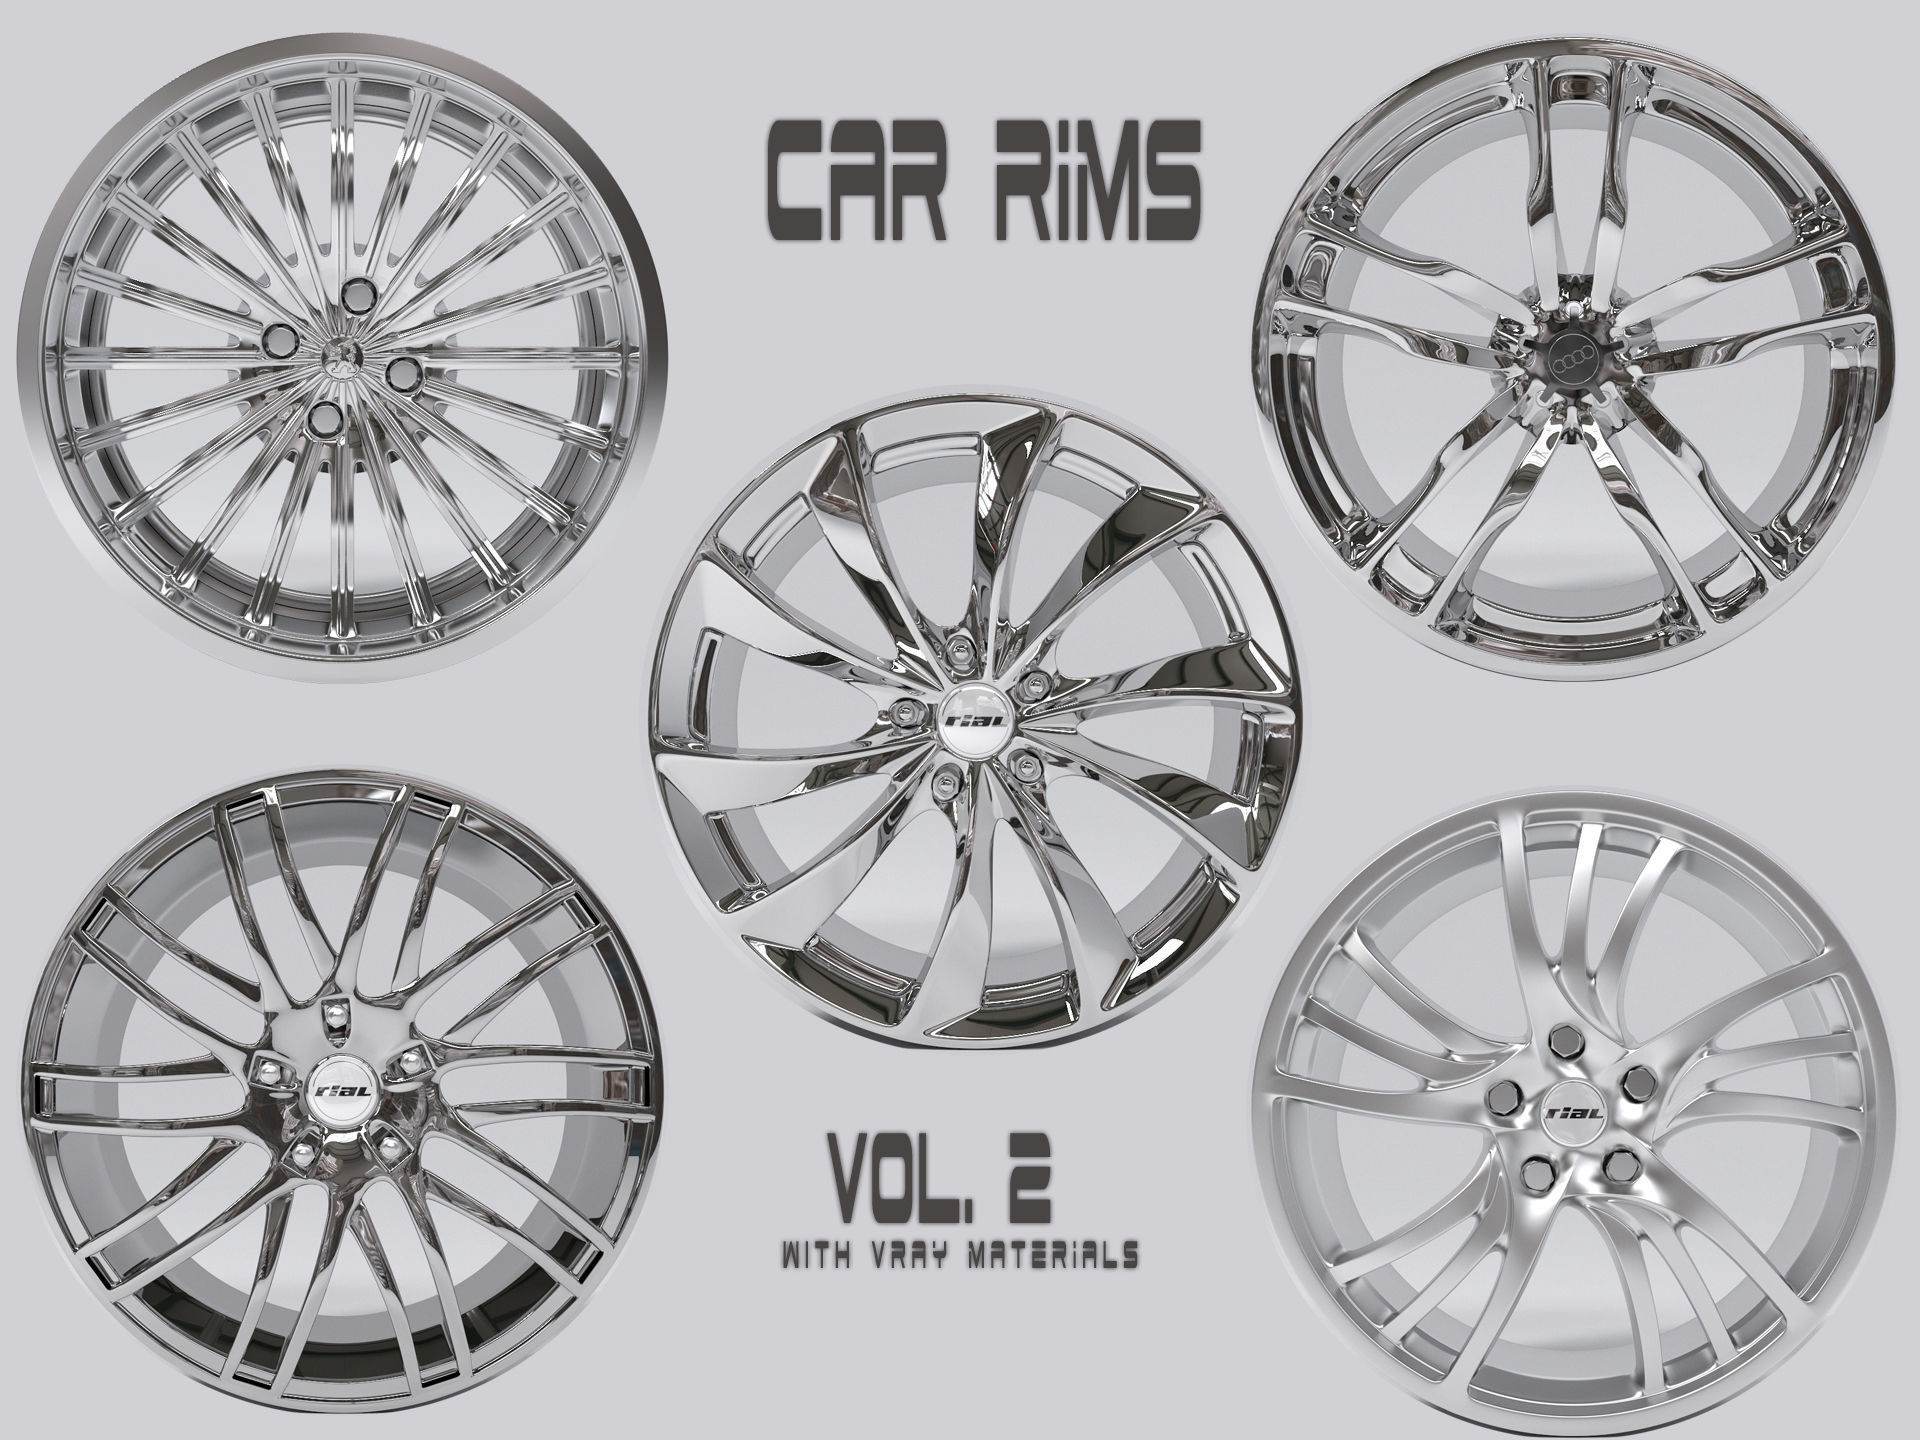 CAR RIMS VOLUME 2